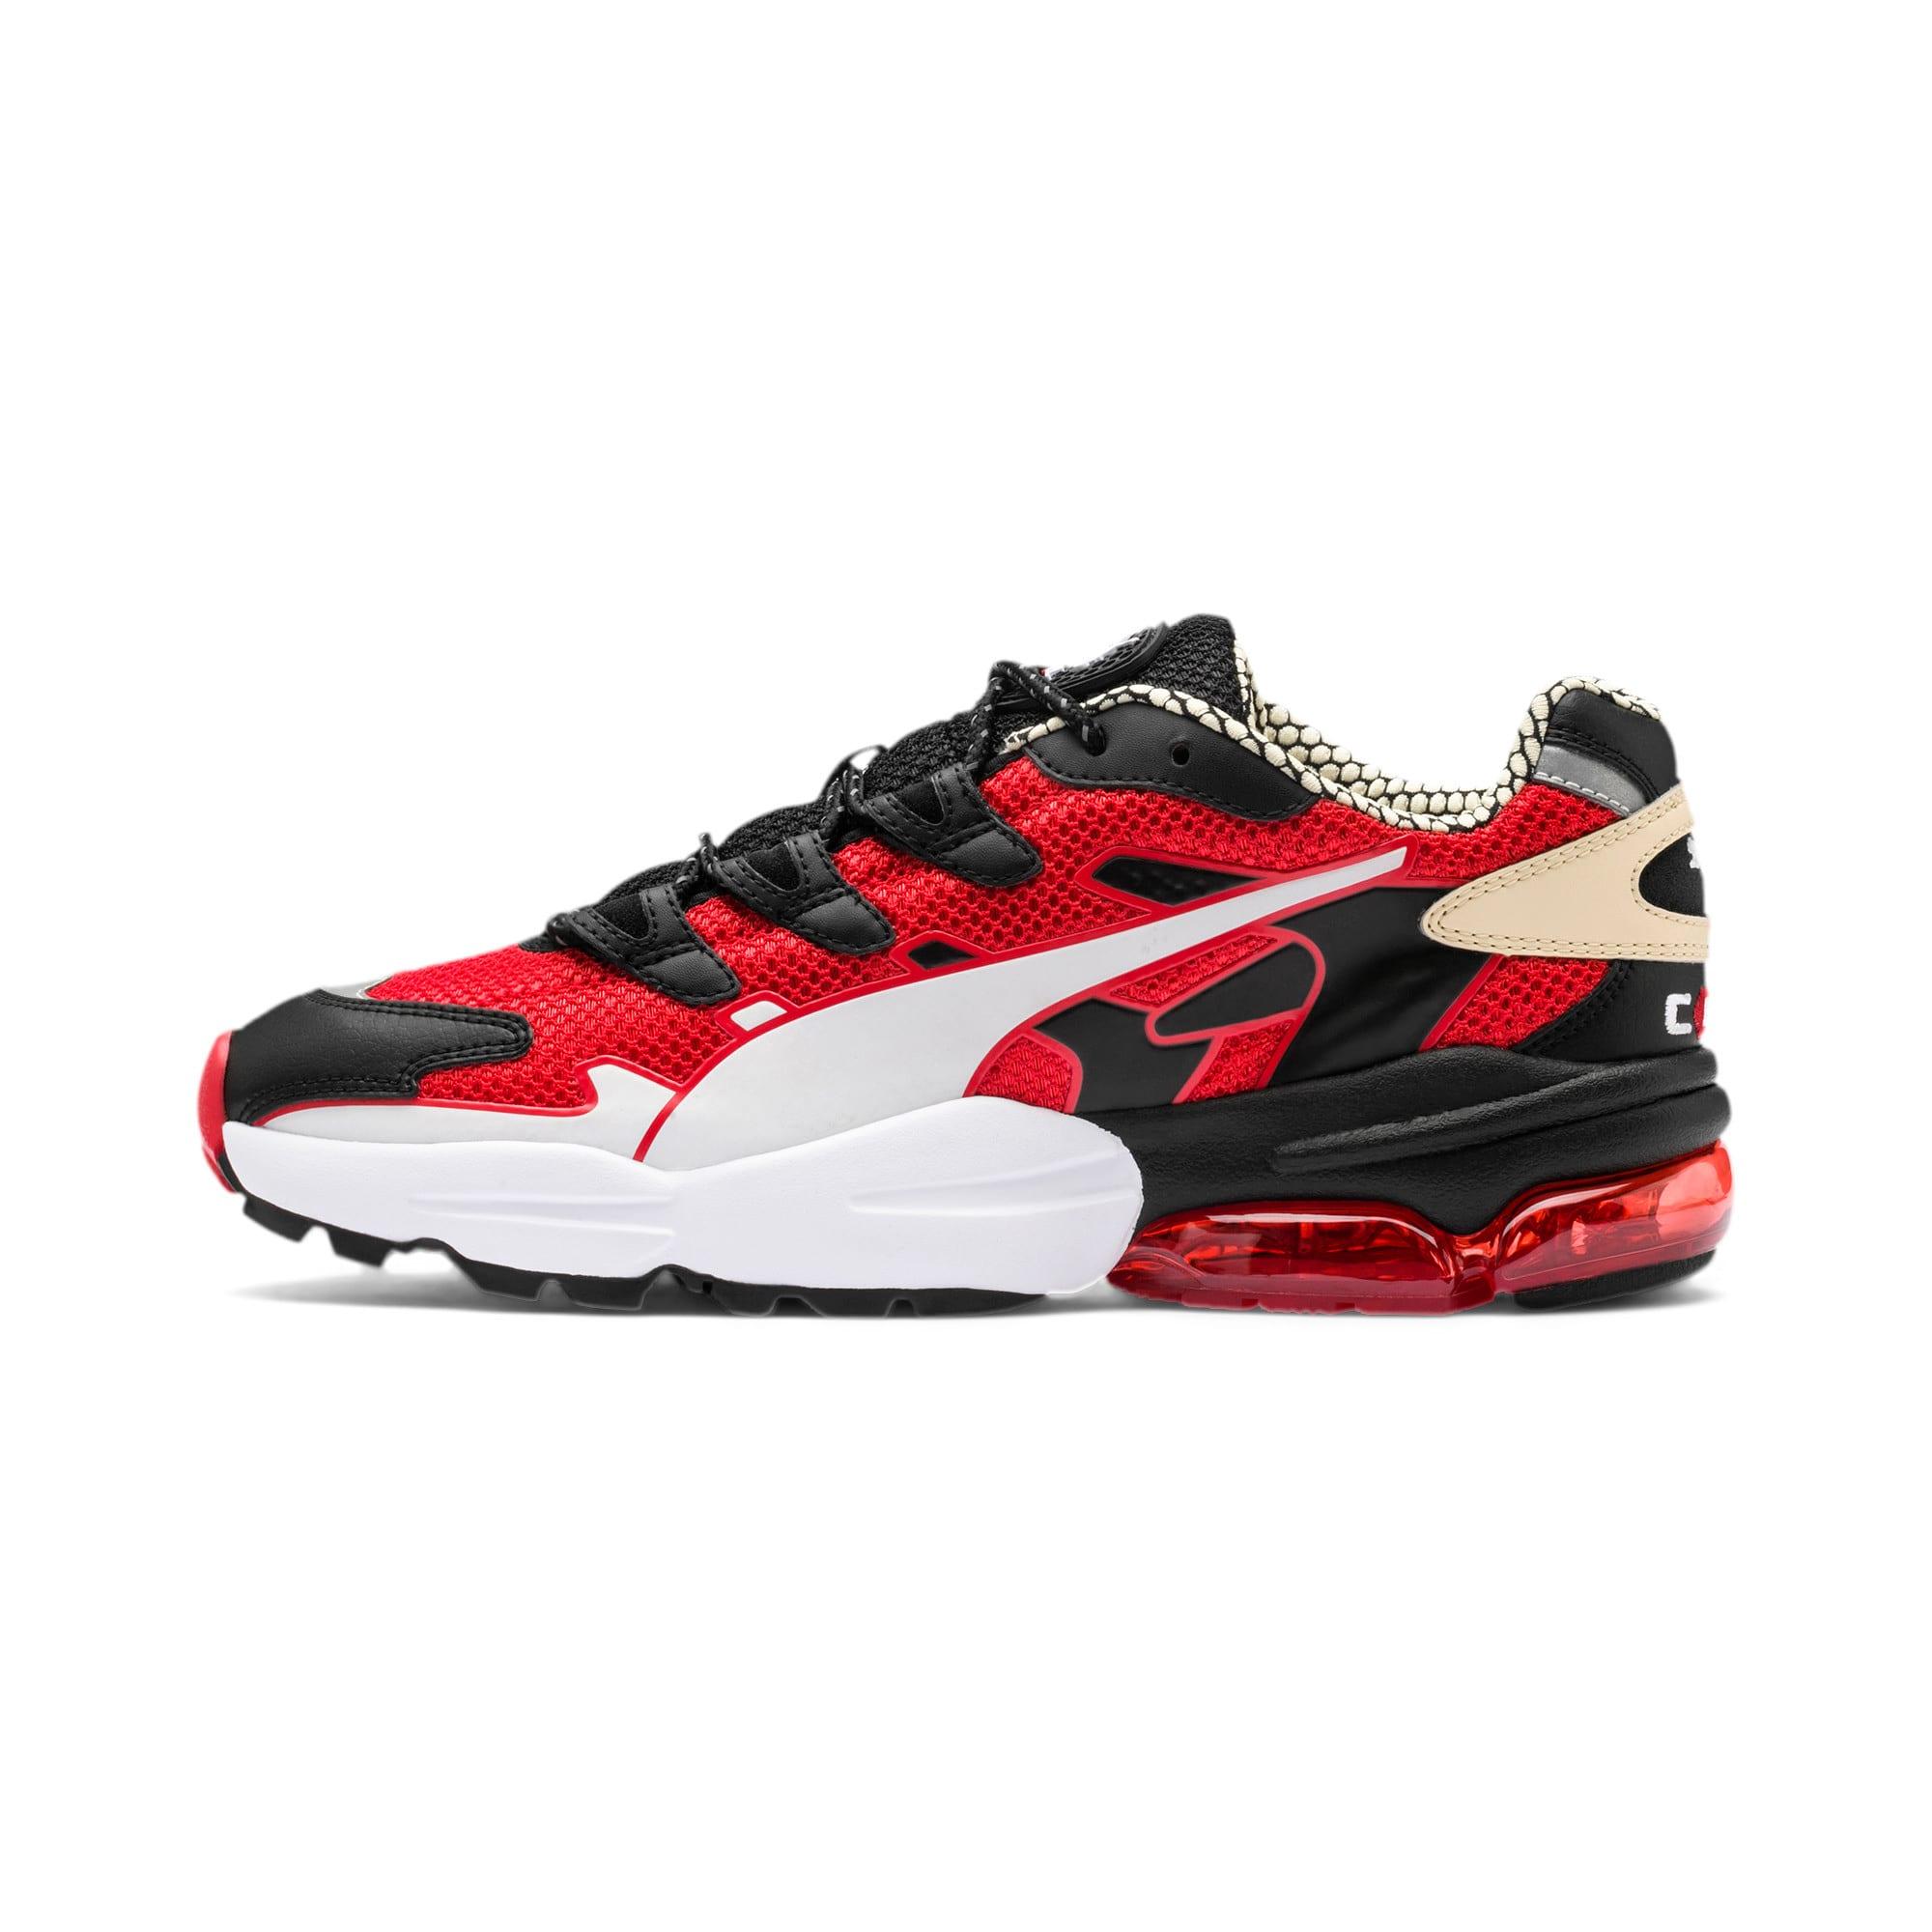 Thumbnail 1 of CELL Alien Kotto Sneakers, High Risk Red-Puma Black, medium